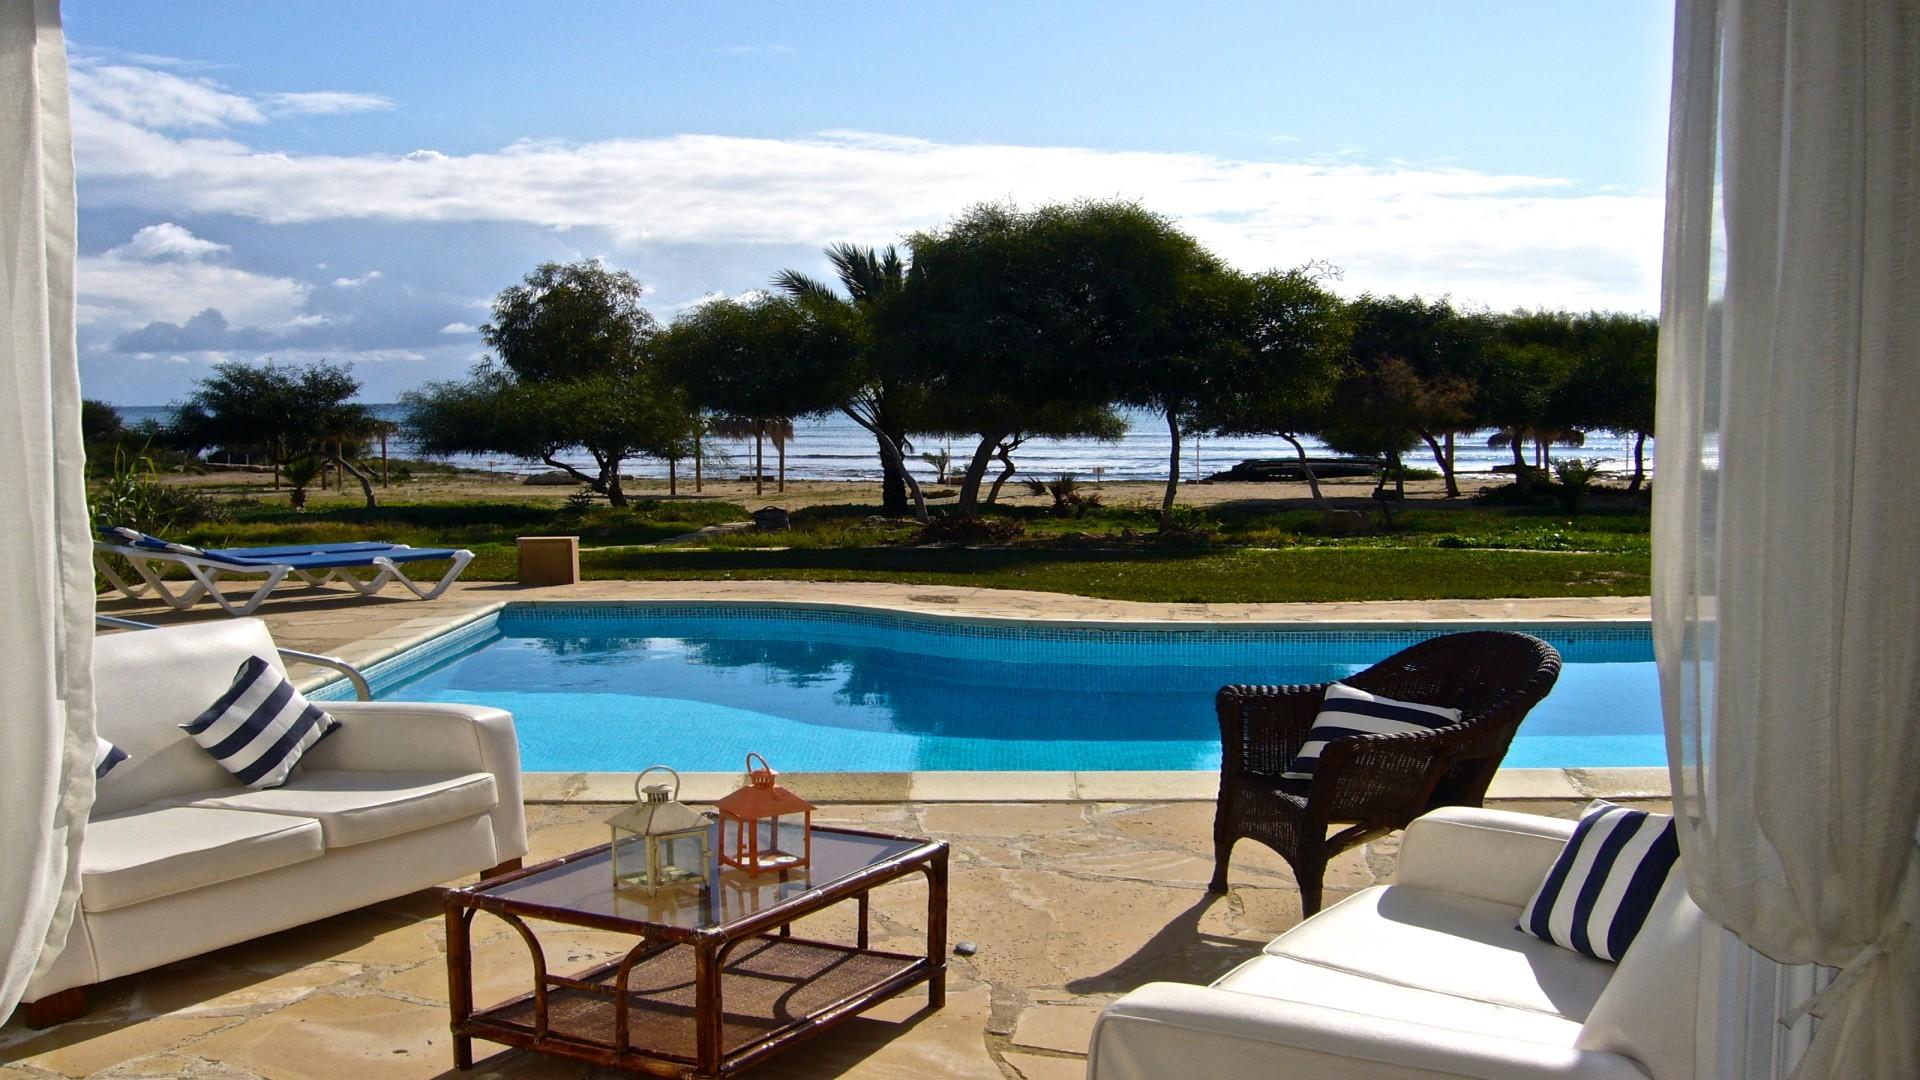 Zwembad bij Villa's Thalassines, Ayia Napa, Cyprus